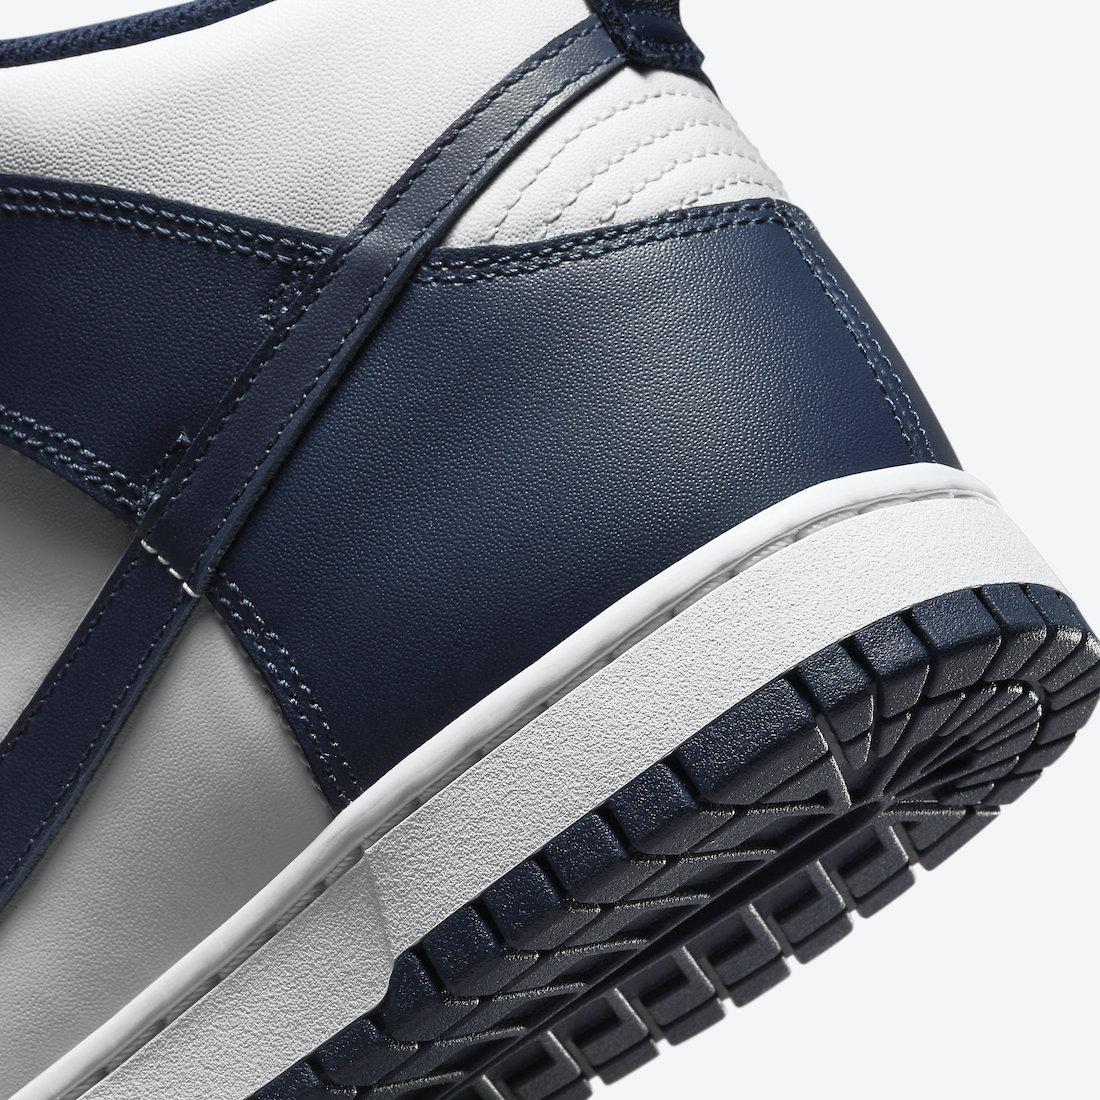 Nike-Dunk-High-Midnight-Navy-DD1399-104-Release-Date-Price-7